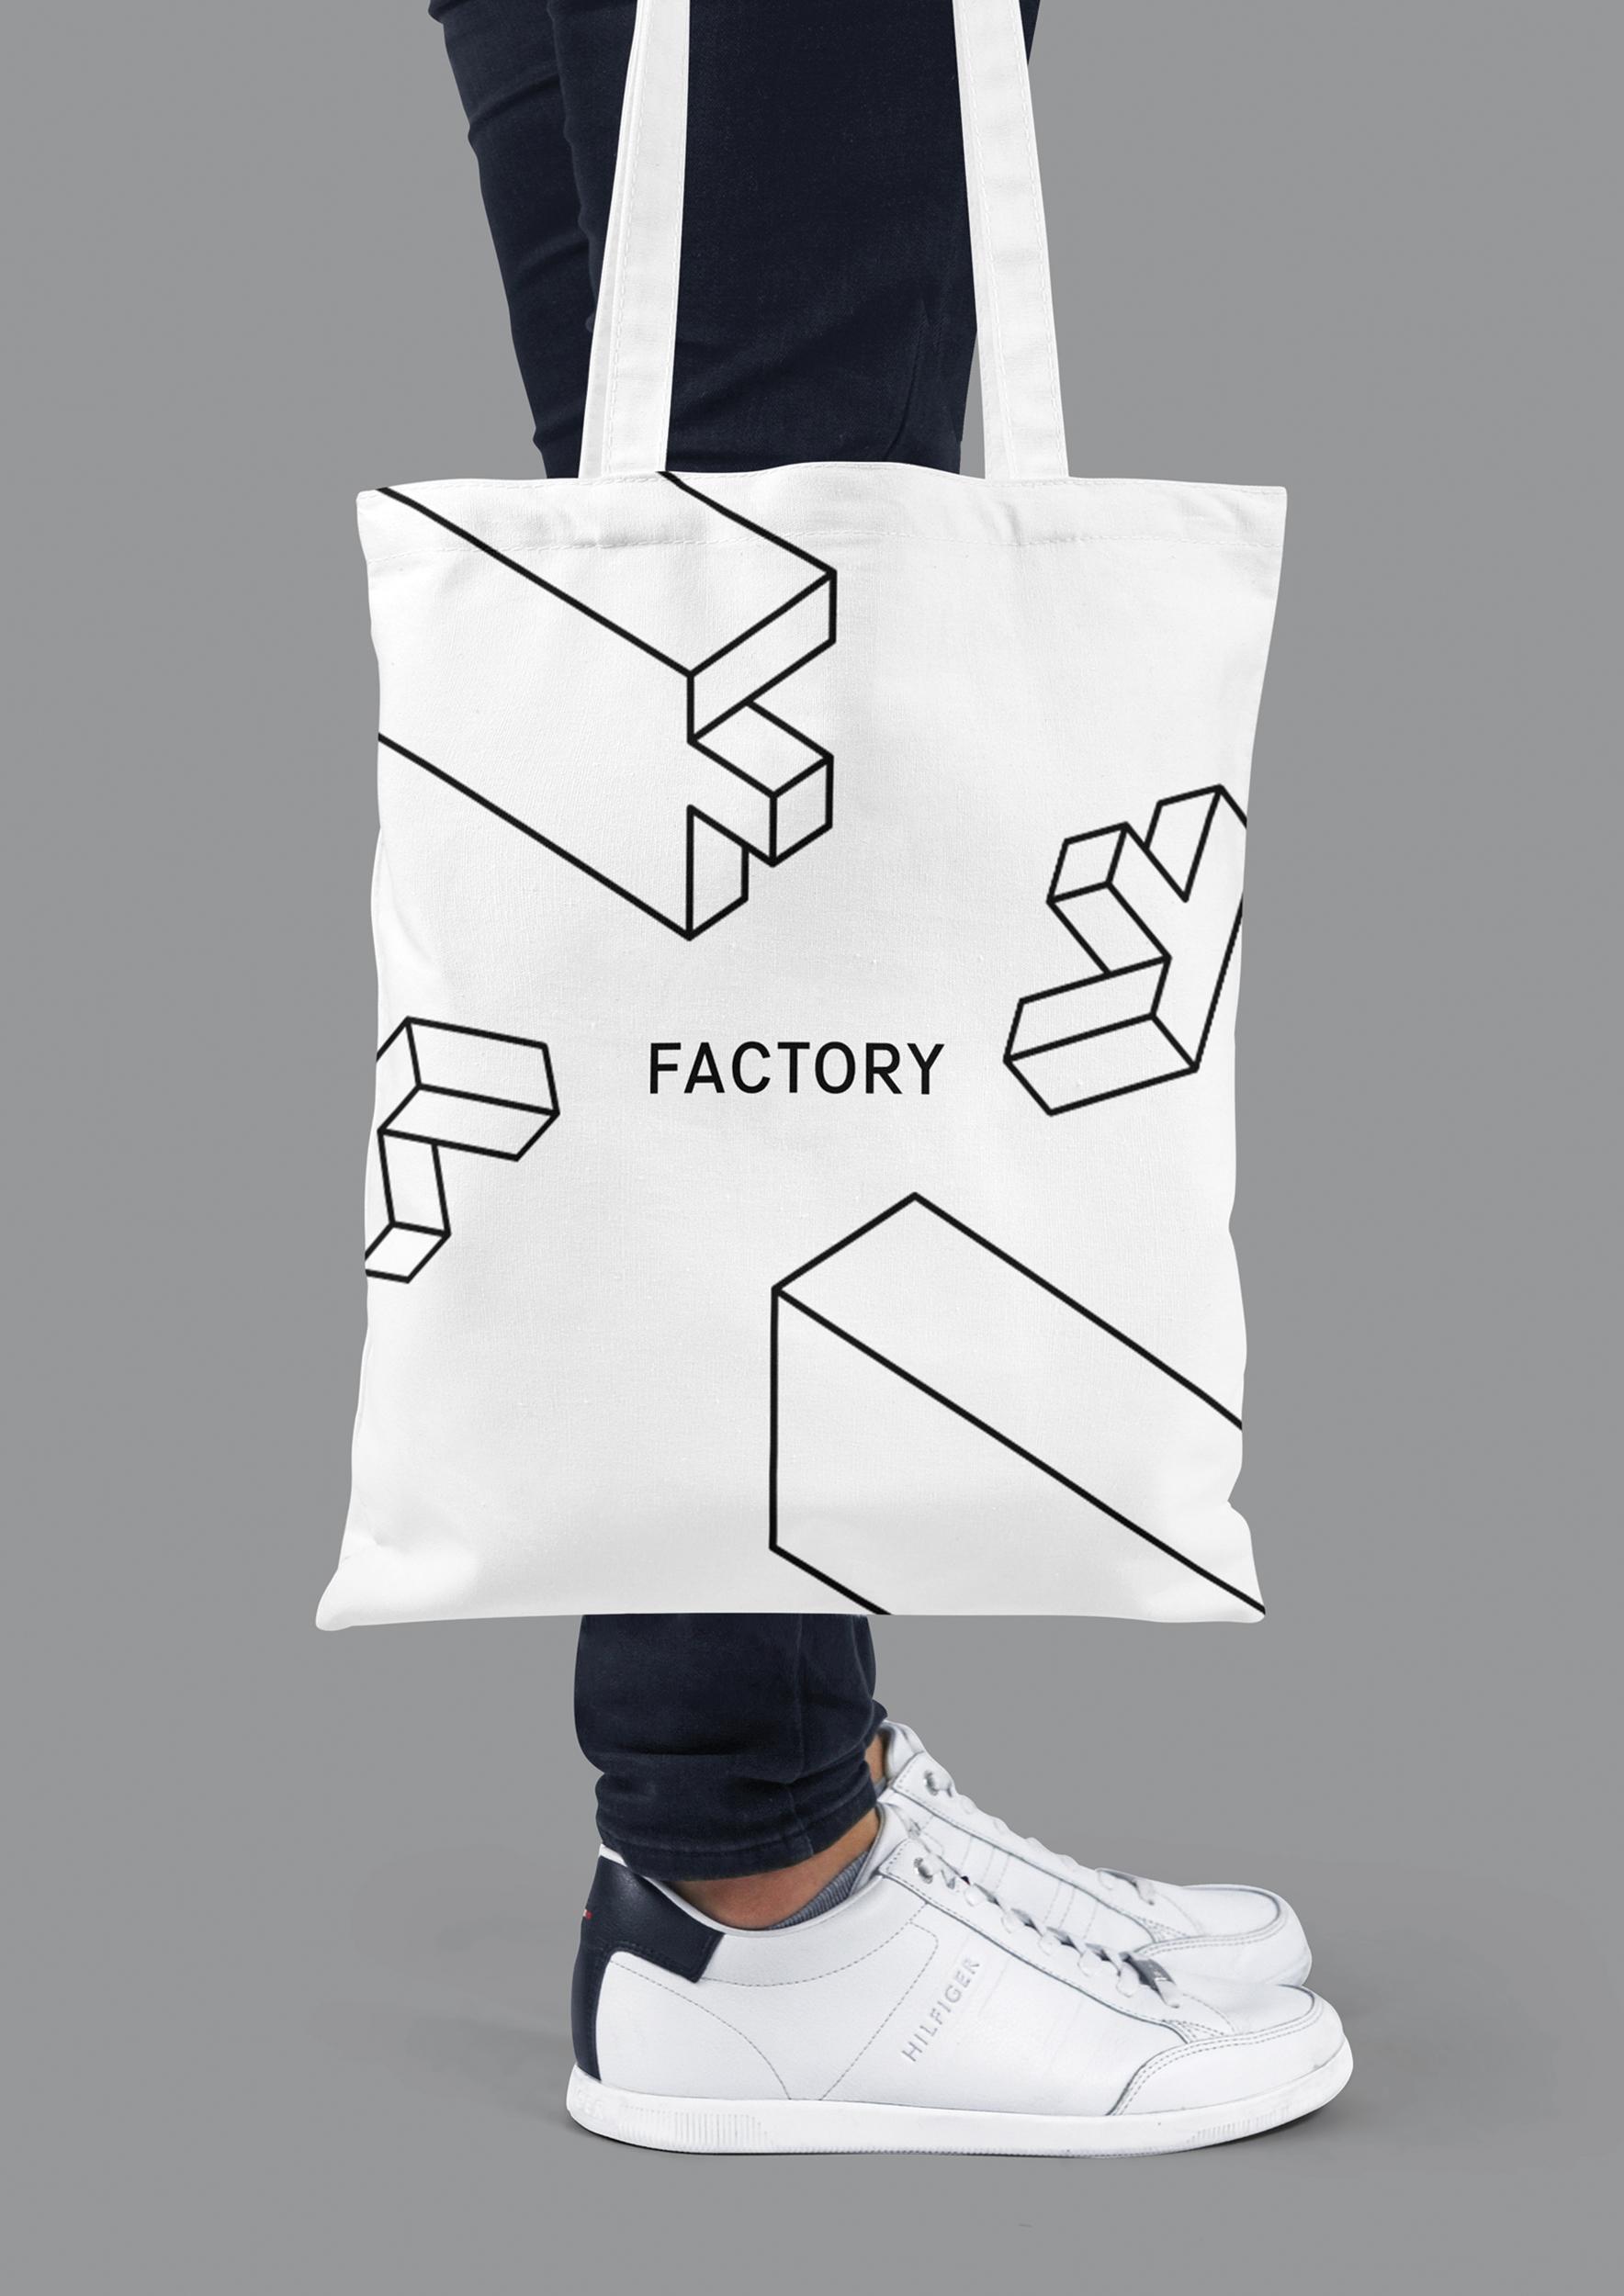 JK_Factory_Bag.jpg